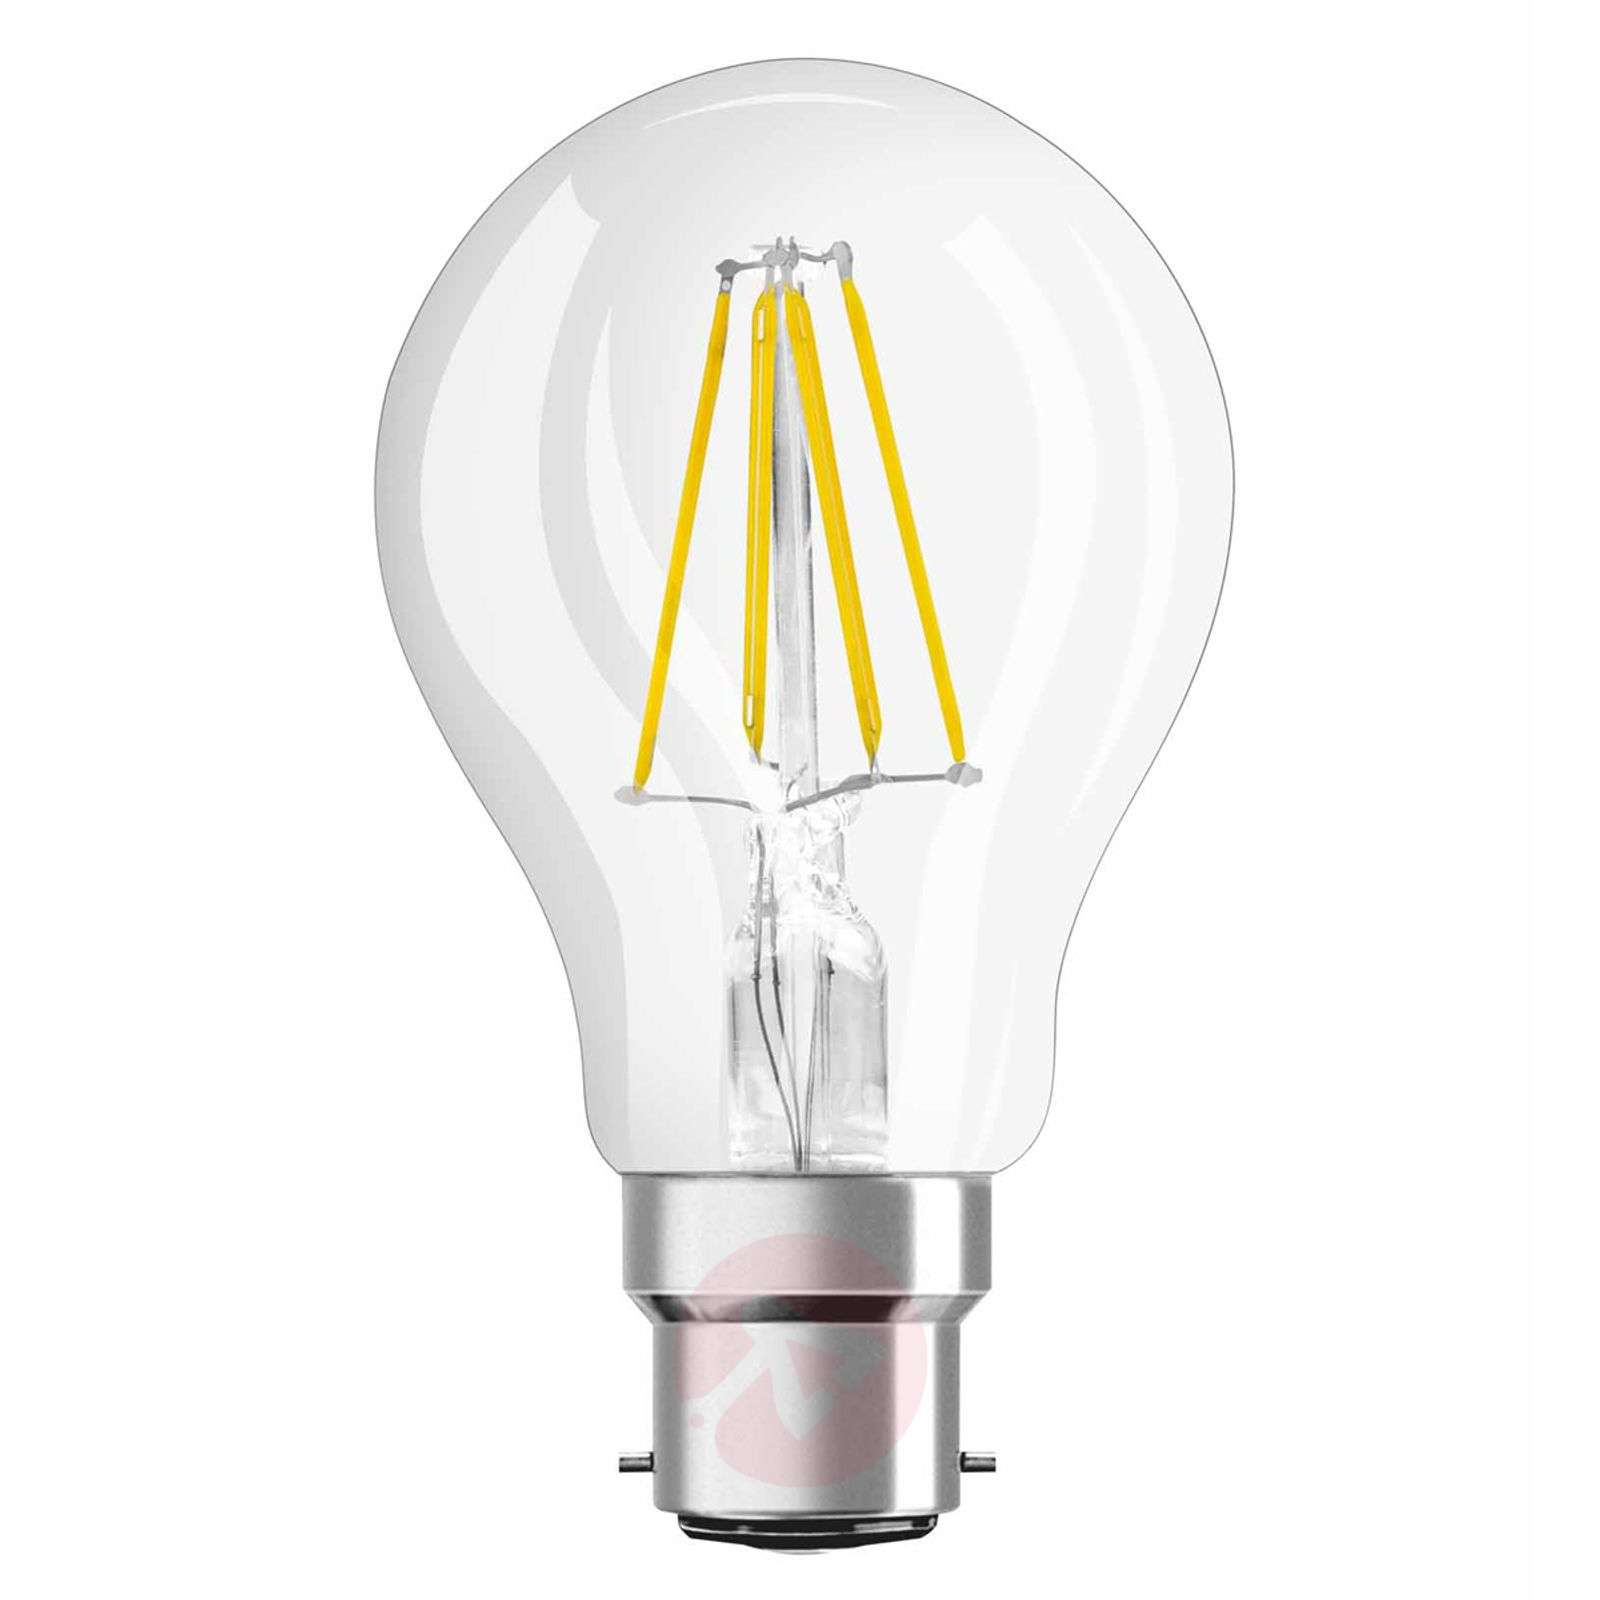 B22 4W 827 LED-hehkulankalamppu-7260920-01